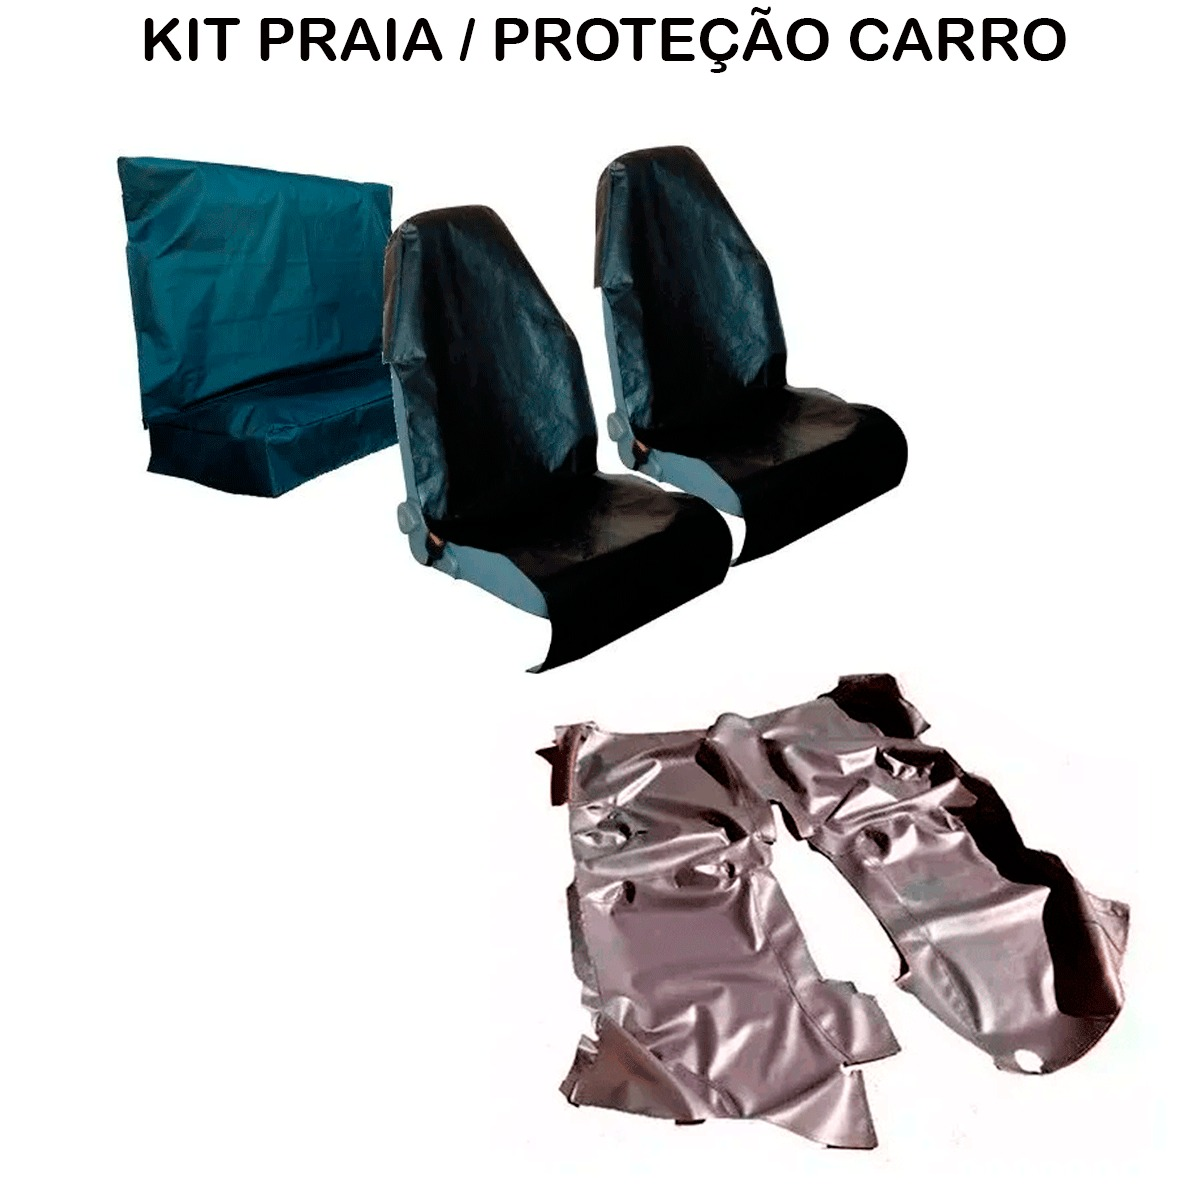 Tapete Em Vinil Fiat Tipo + Capa Banco Protecao Banco Areia Suor Academia